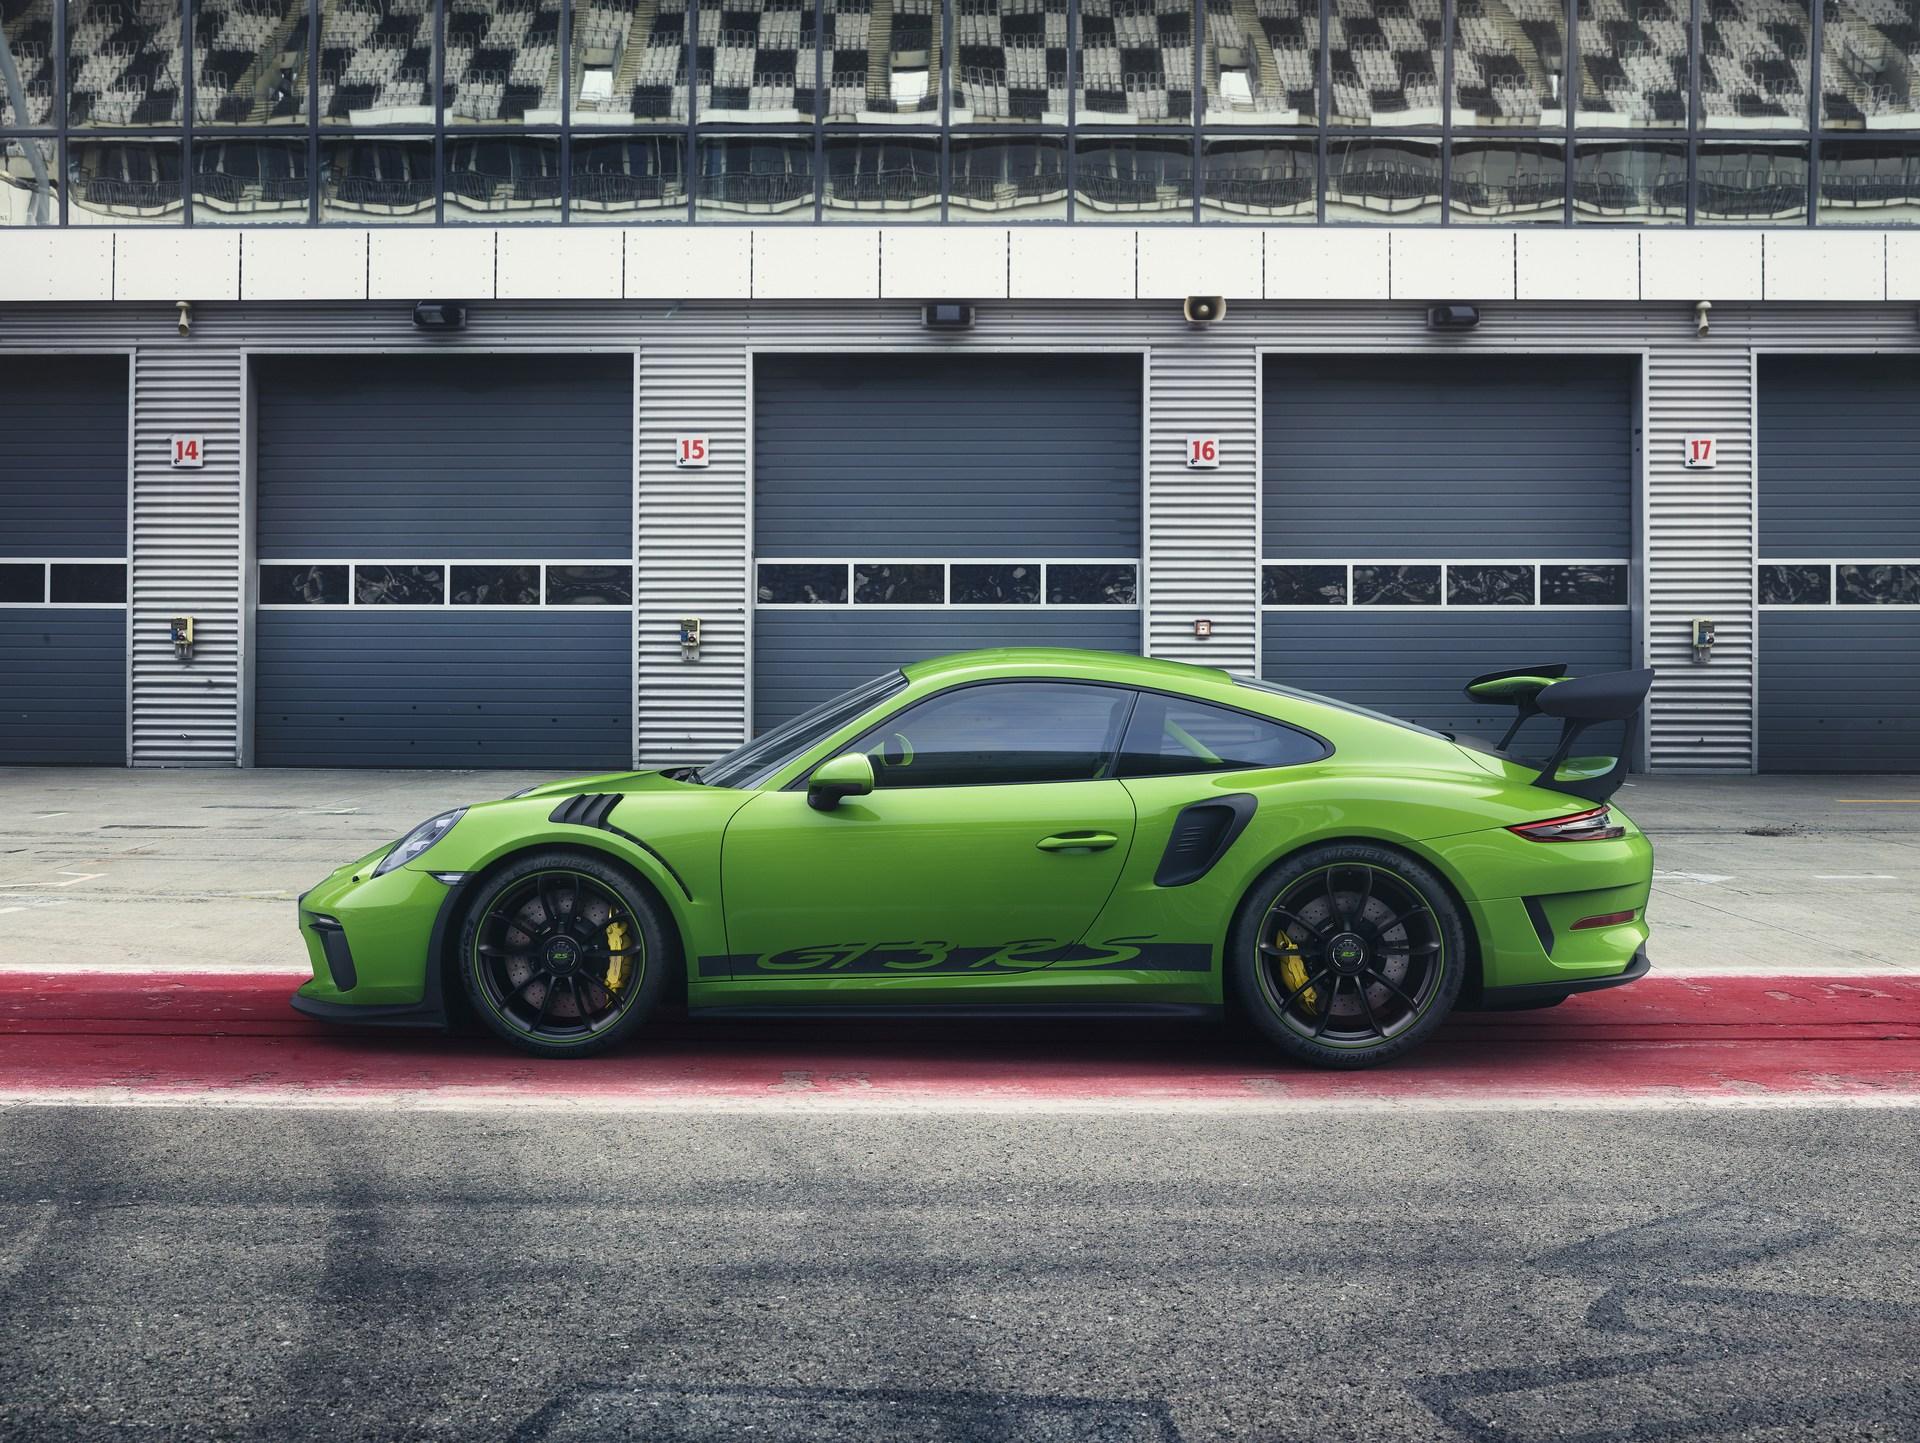 2019 Porsche 911 Gt3 Rs Gets Weissach Package Sub 7